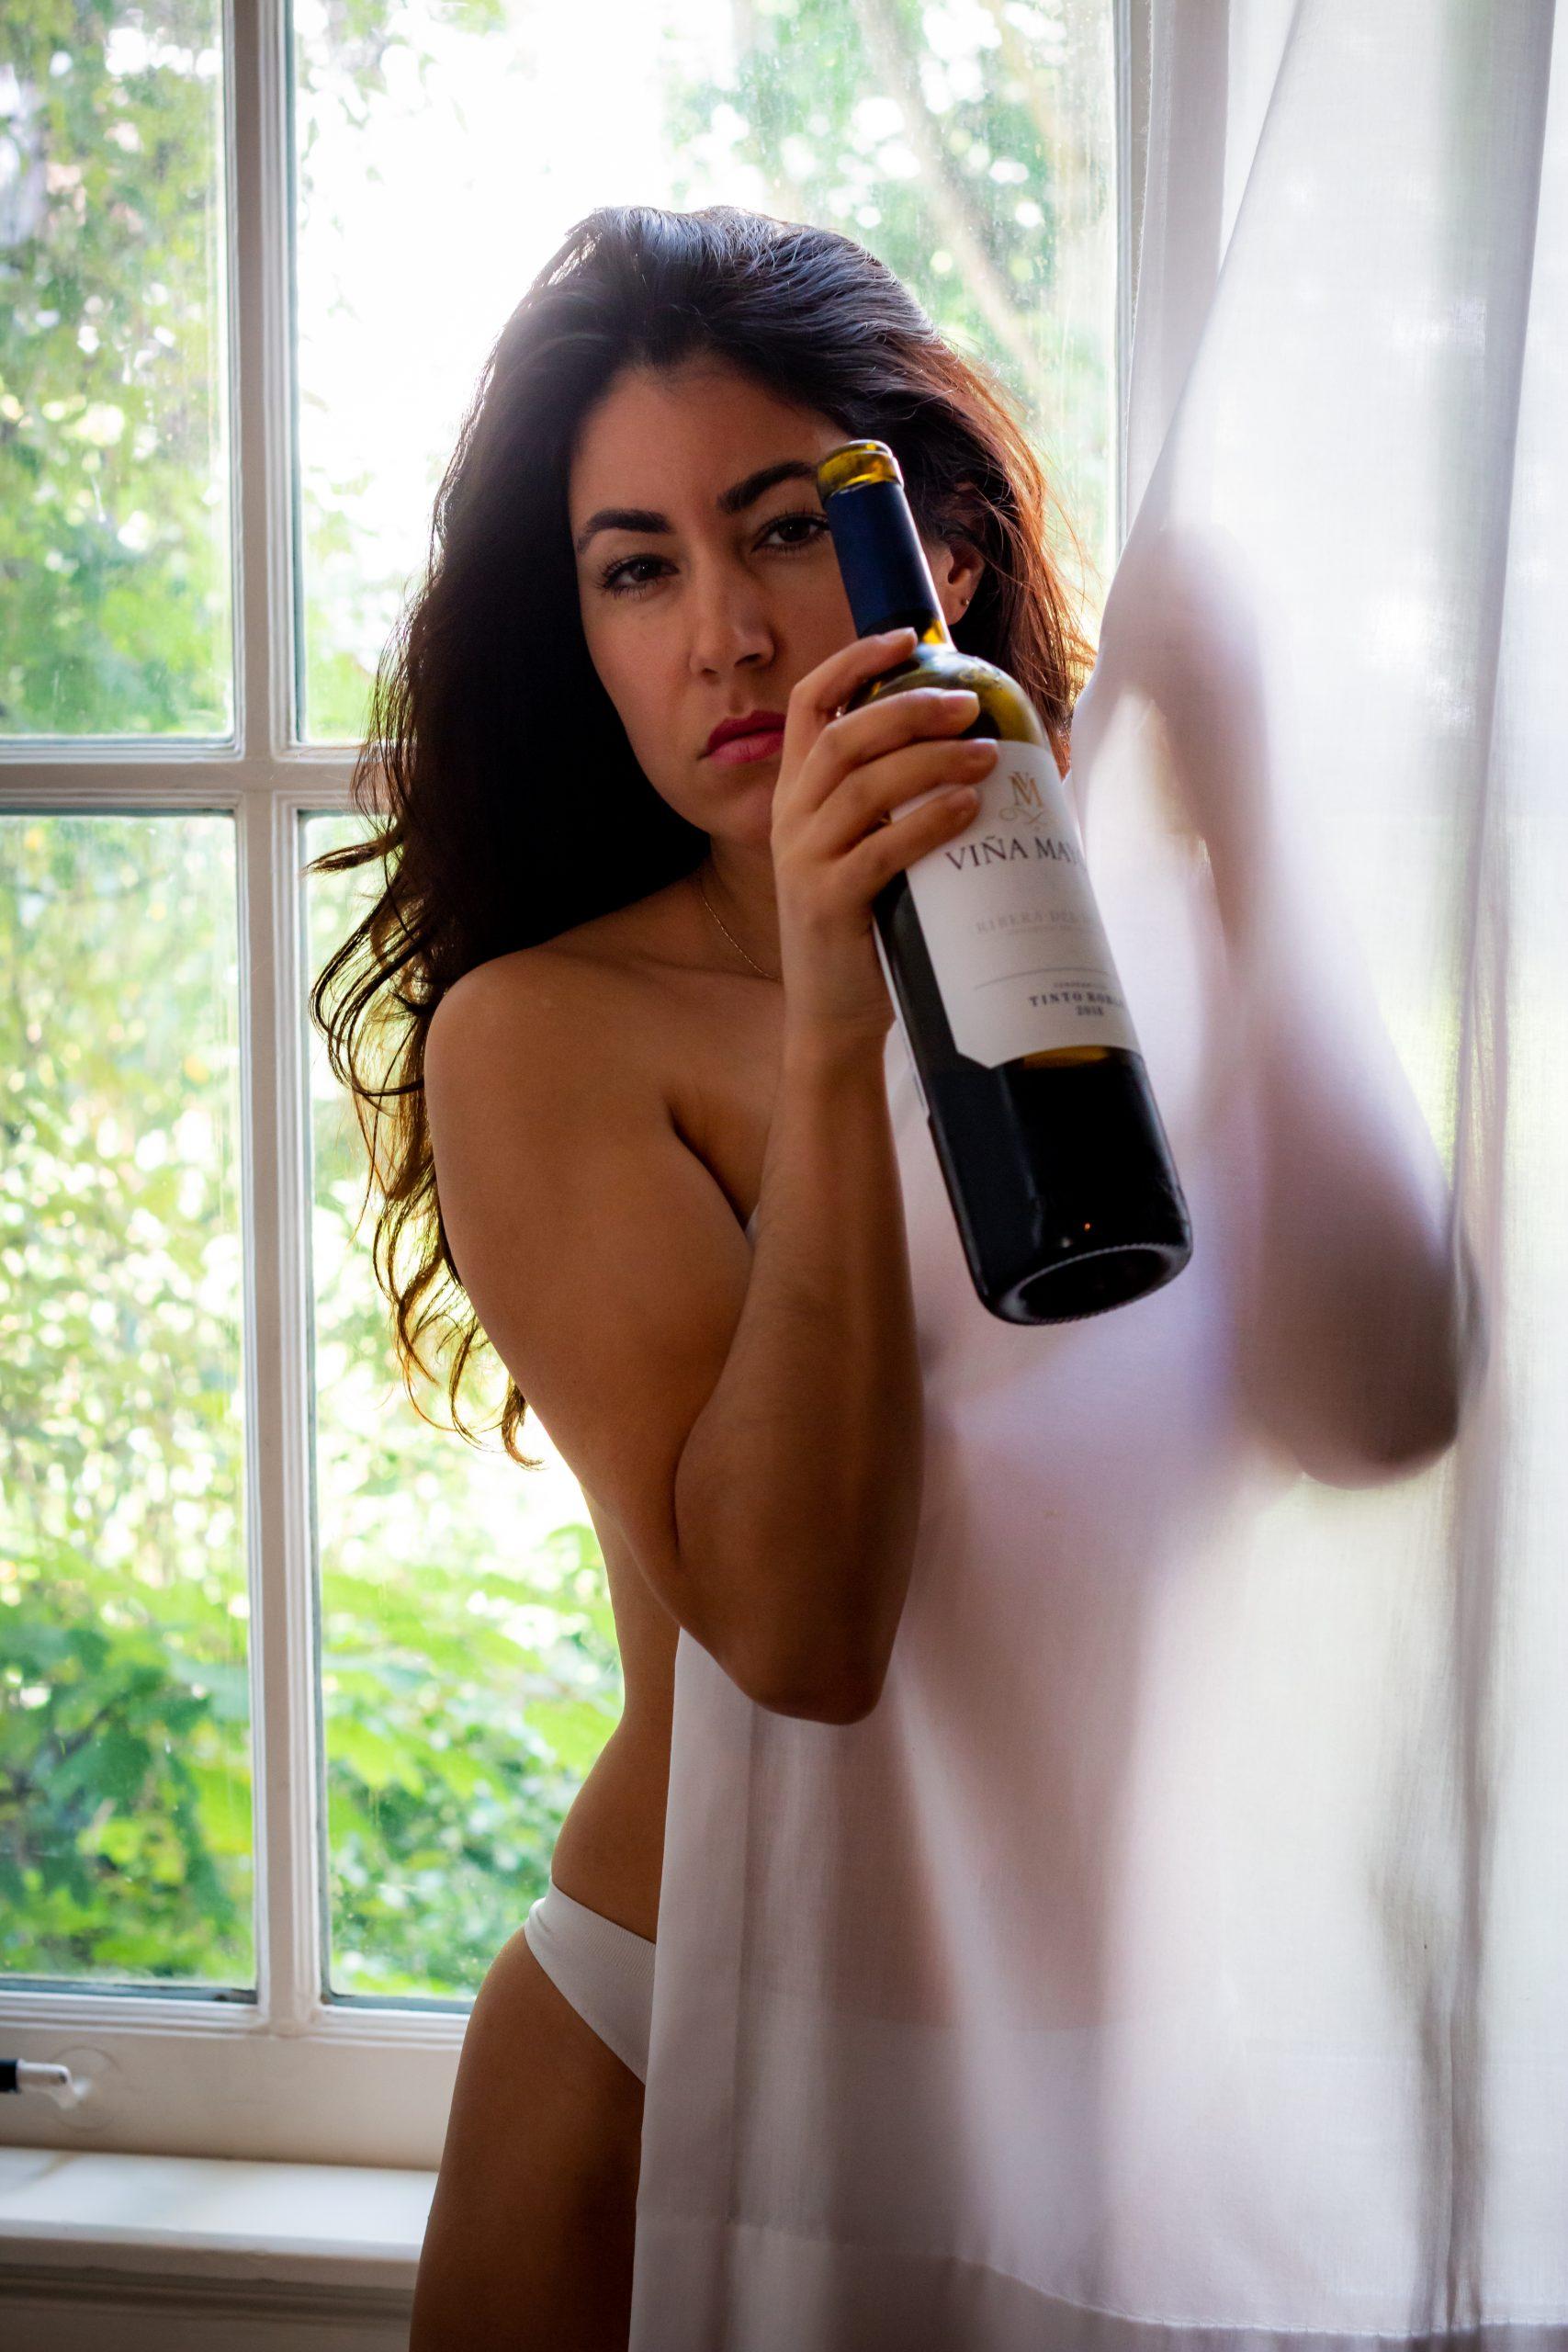 wine behind curtains